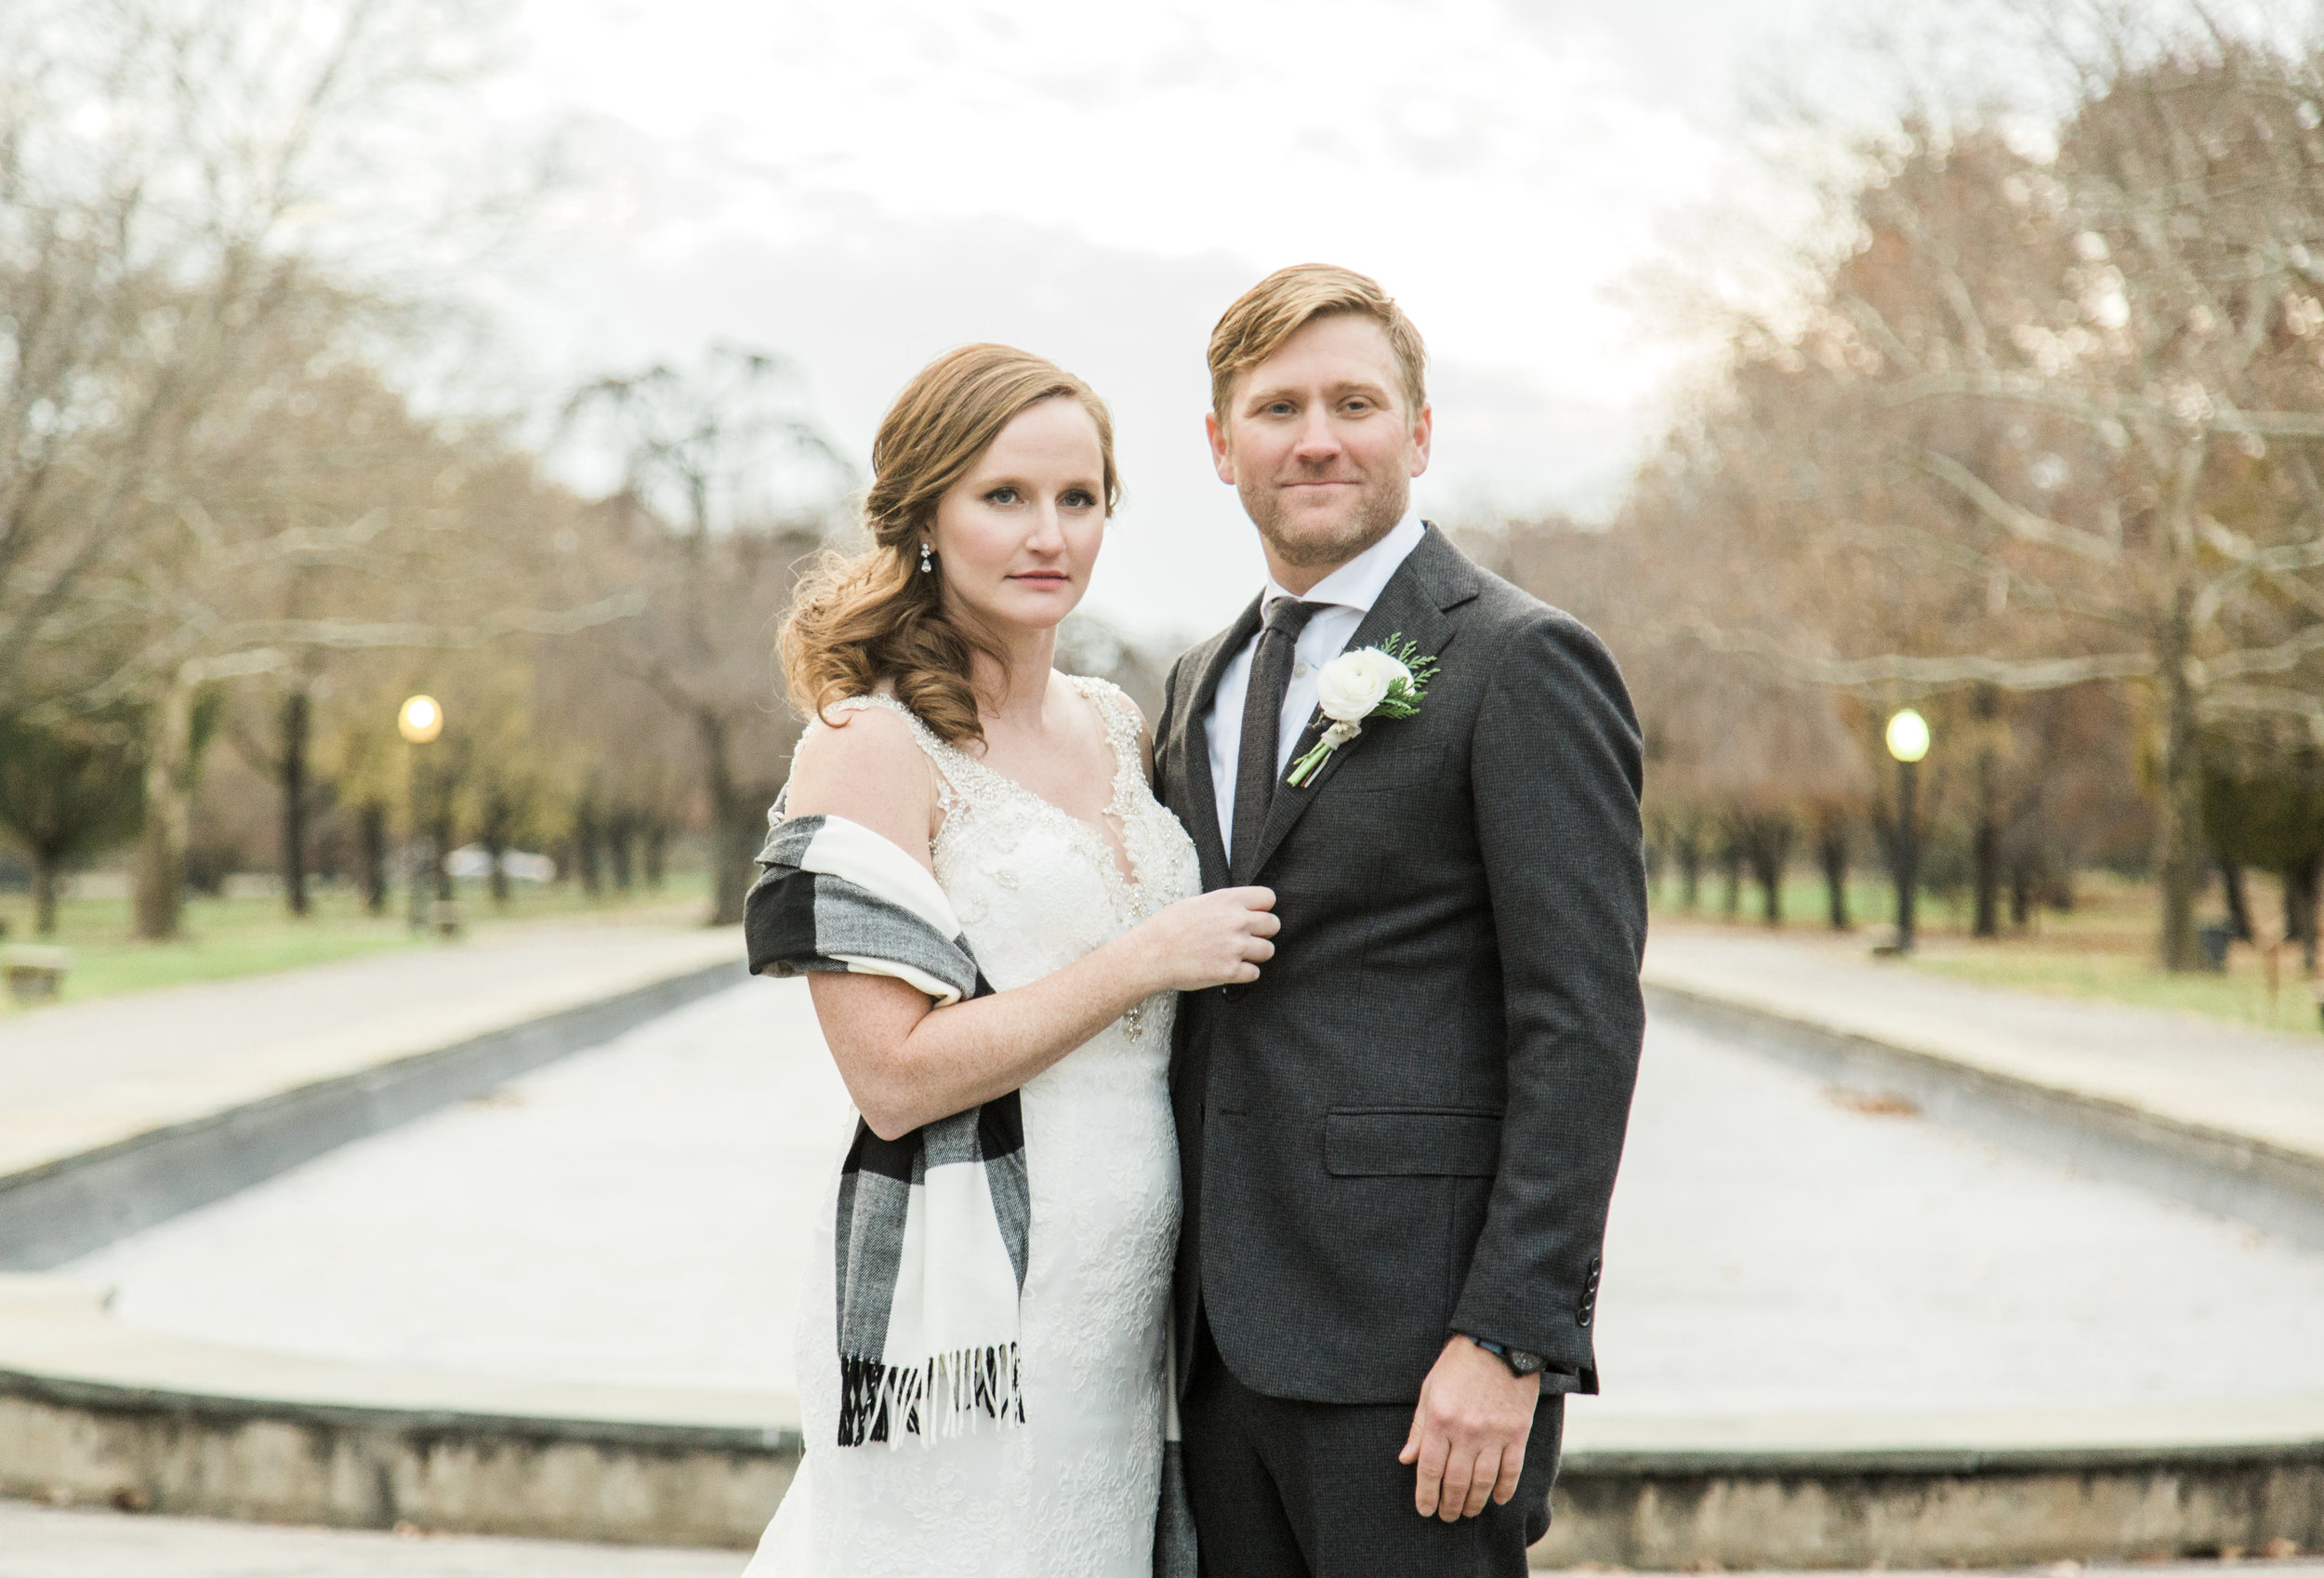 Hudson-Nichols-Martha-Stewart-Weddings-Winter-Ski-Philadelphia-Claire-Conner_133.jpg